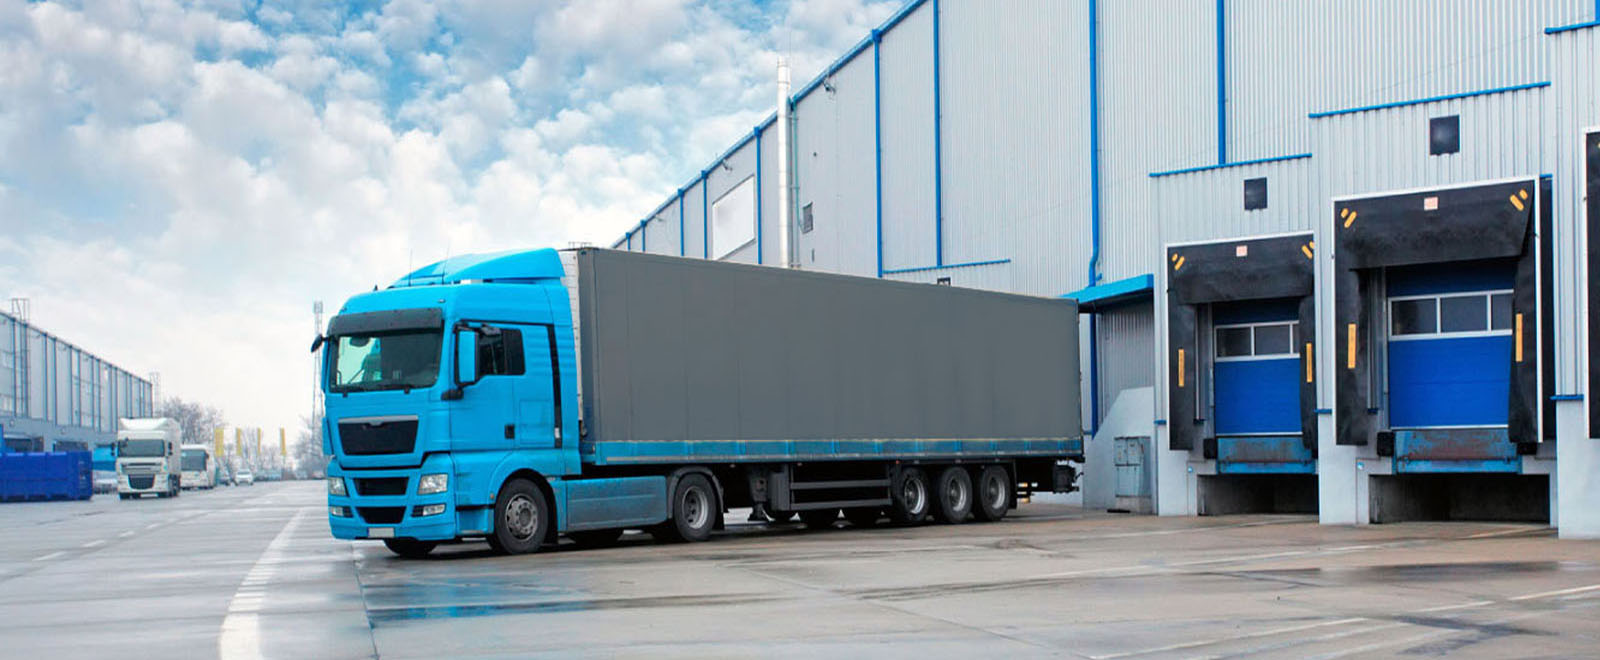 df9bf58f4a94b Транспортная компания - доставка грузов по Екатеринбургу, Тюмени, Москве,  Санкт-Петербурге, ХМАО и ЯНАО | Грузлайн